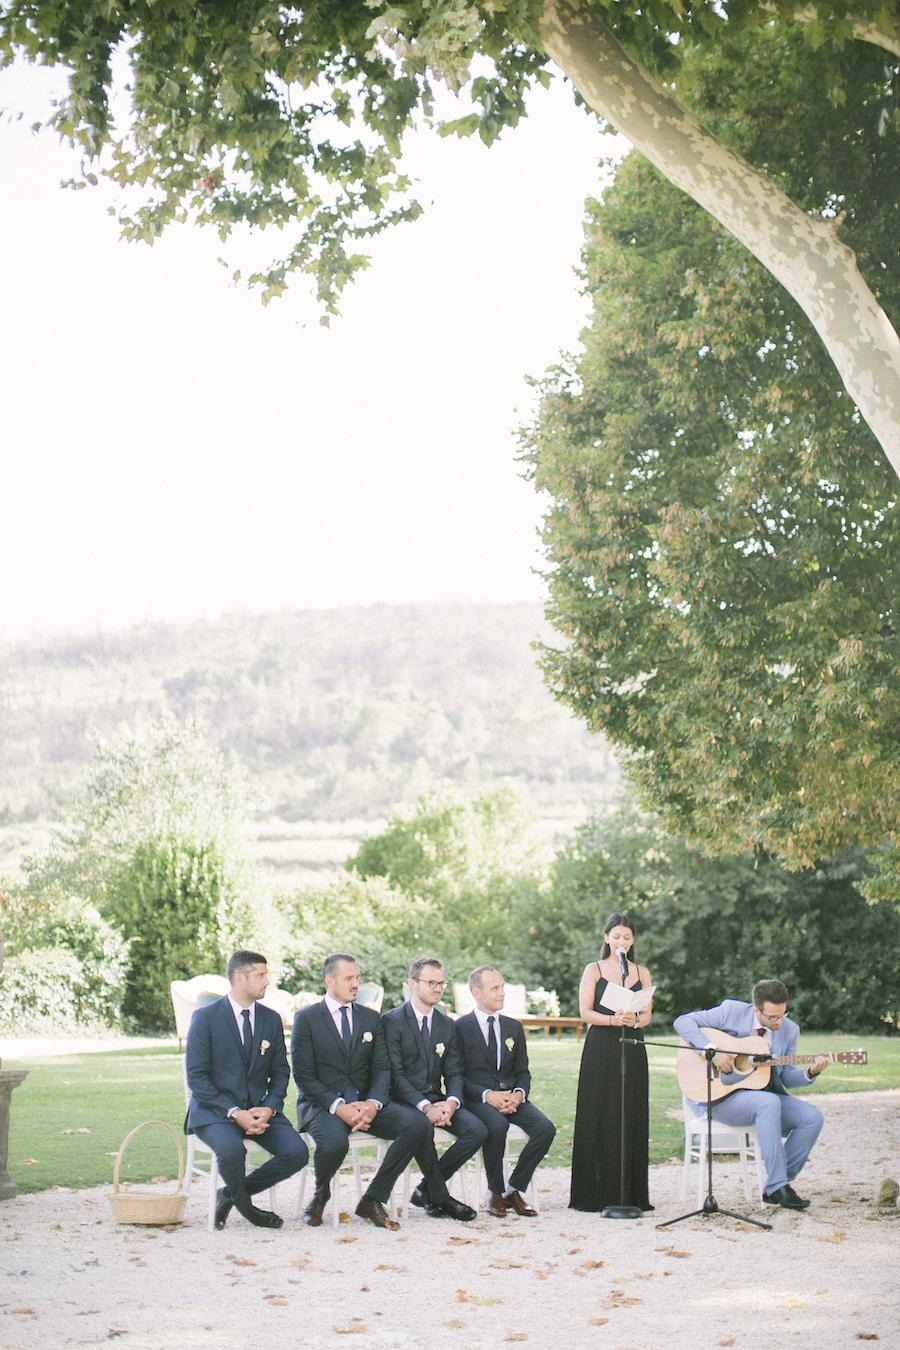 saya-photography-wedding-photographer-provence-chateau-de-robernier-62.jpg